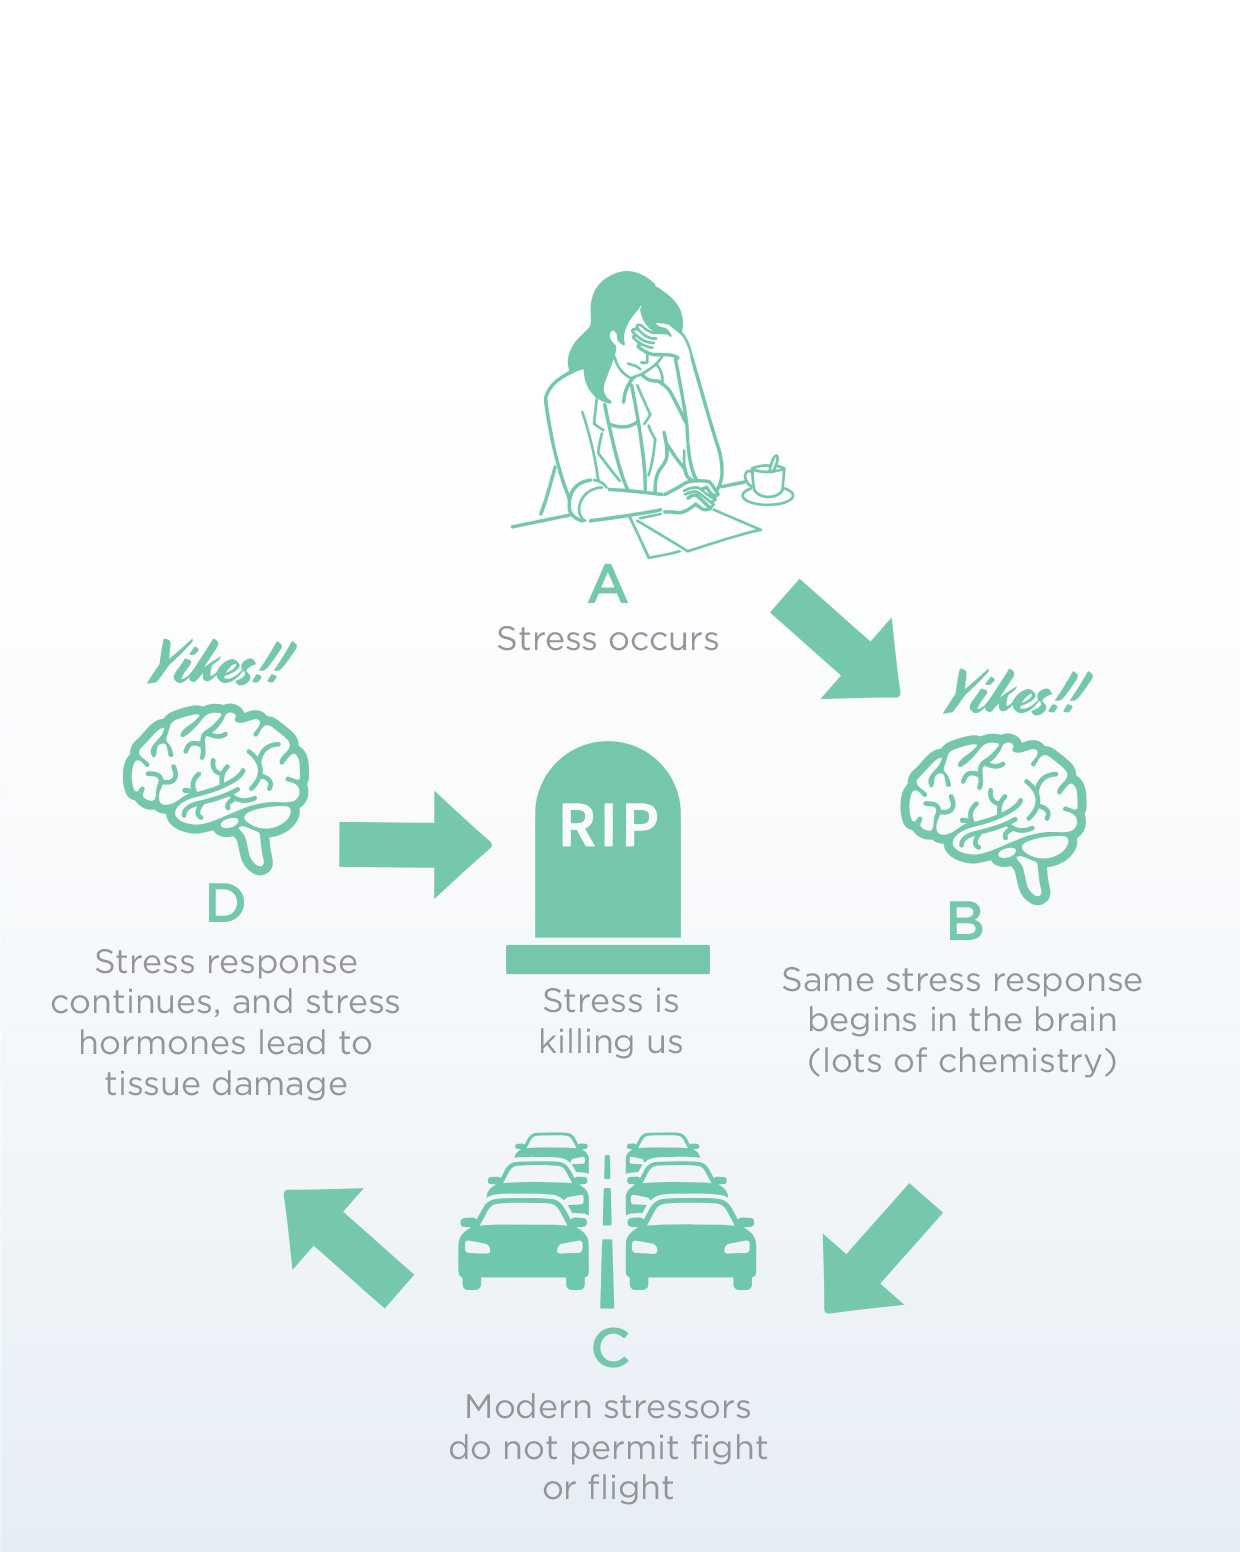 Figure 2: Chronic (Long-term) Stress